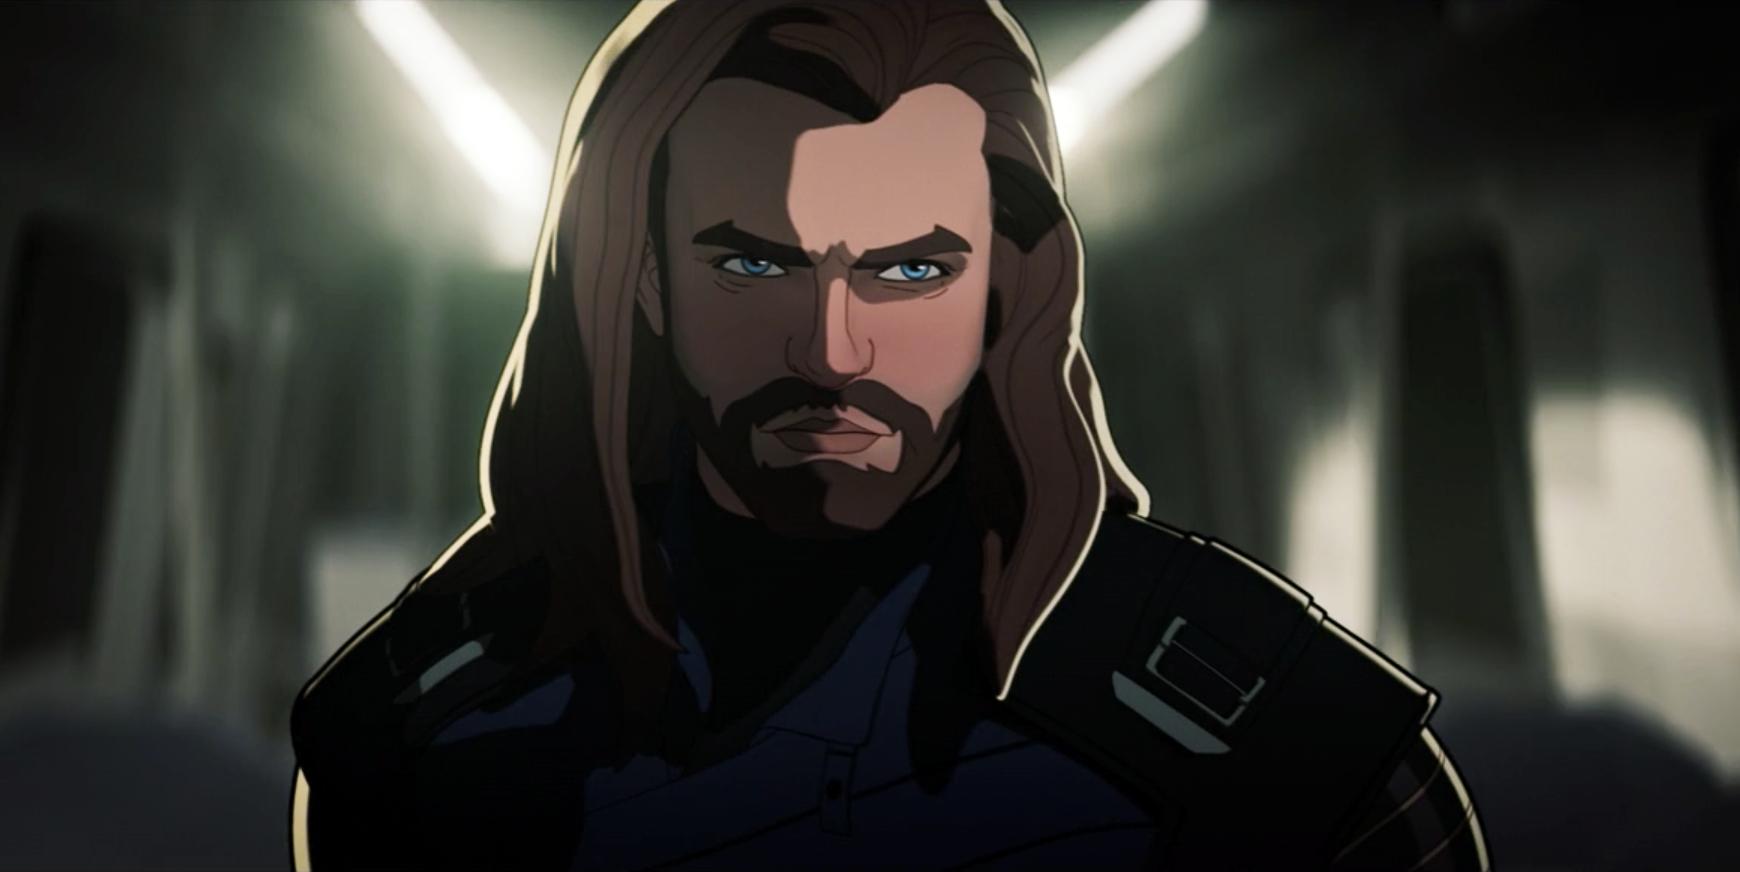 Bucky Barnes, aka the Winter Soldier